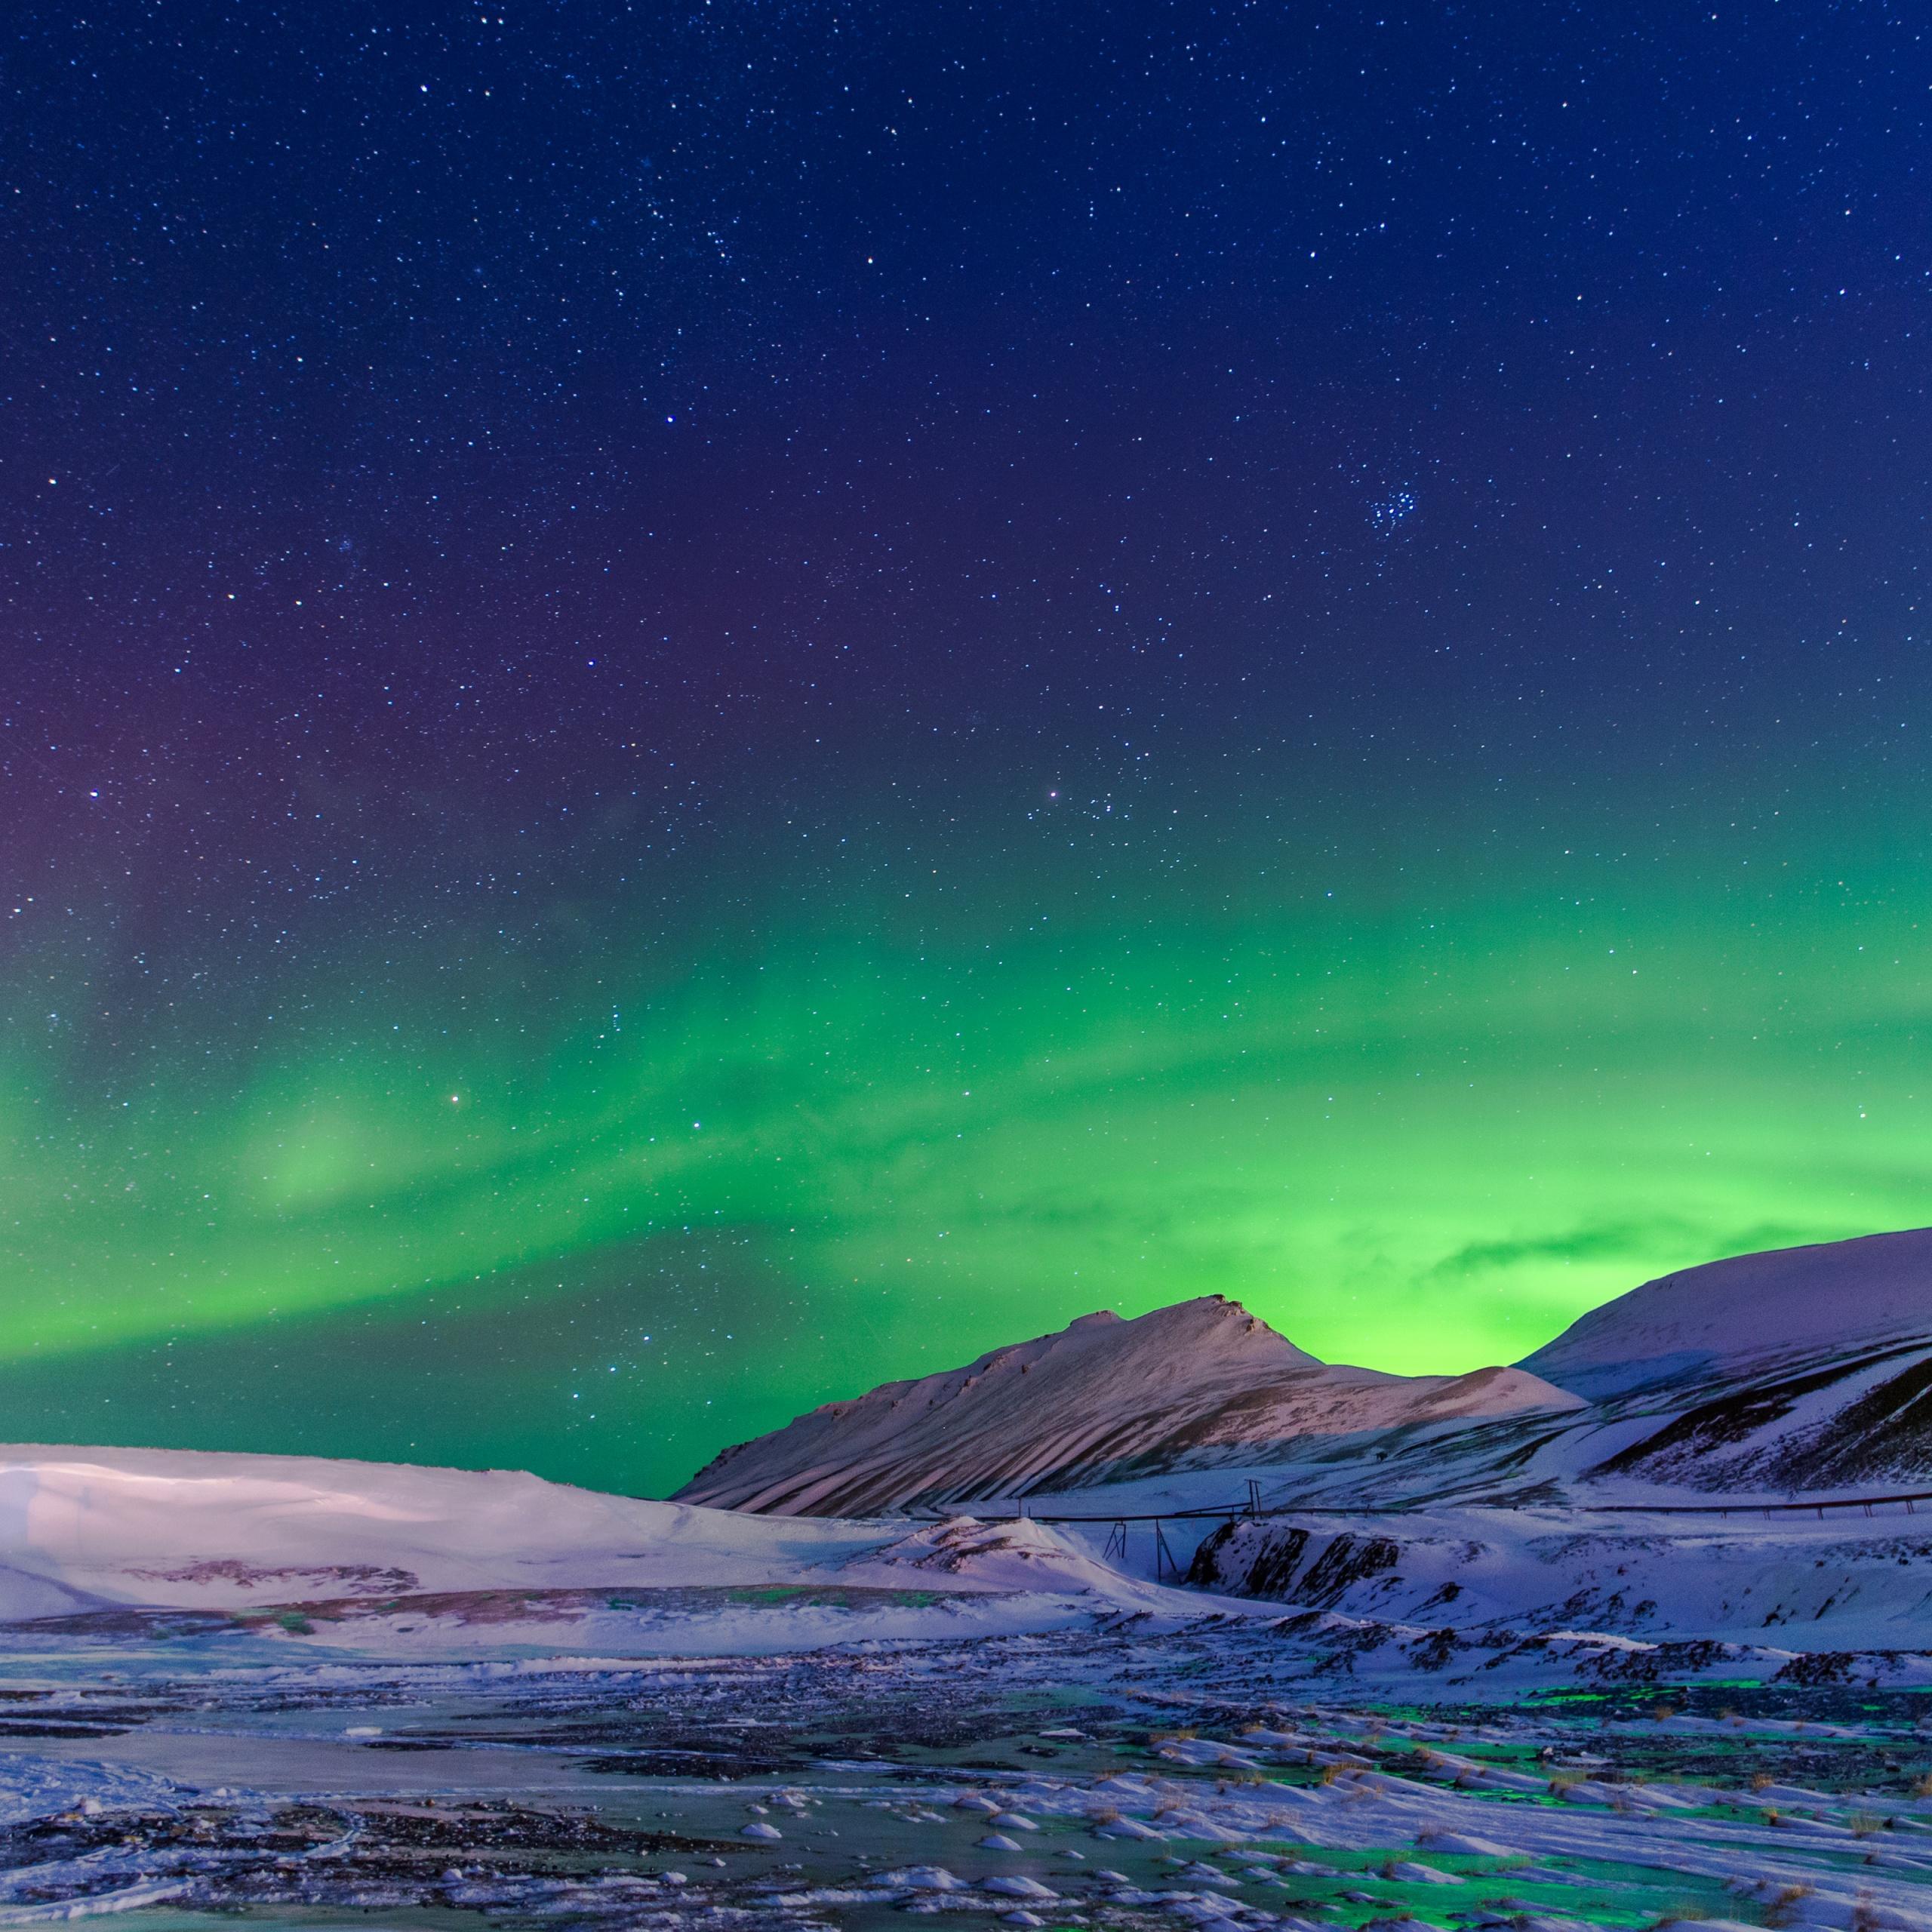 4K Wallpaper Northern Lights, Aurora Borealis, Winter